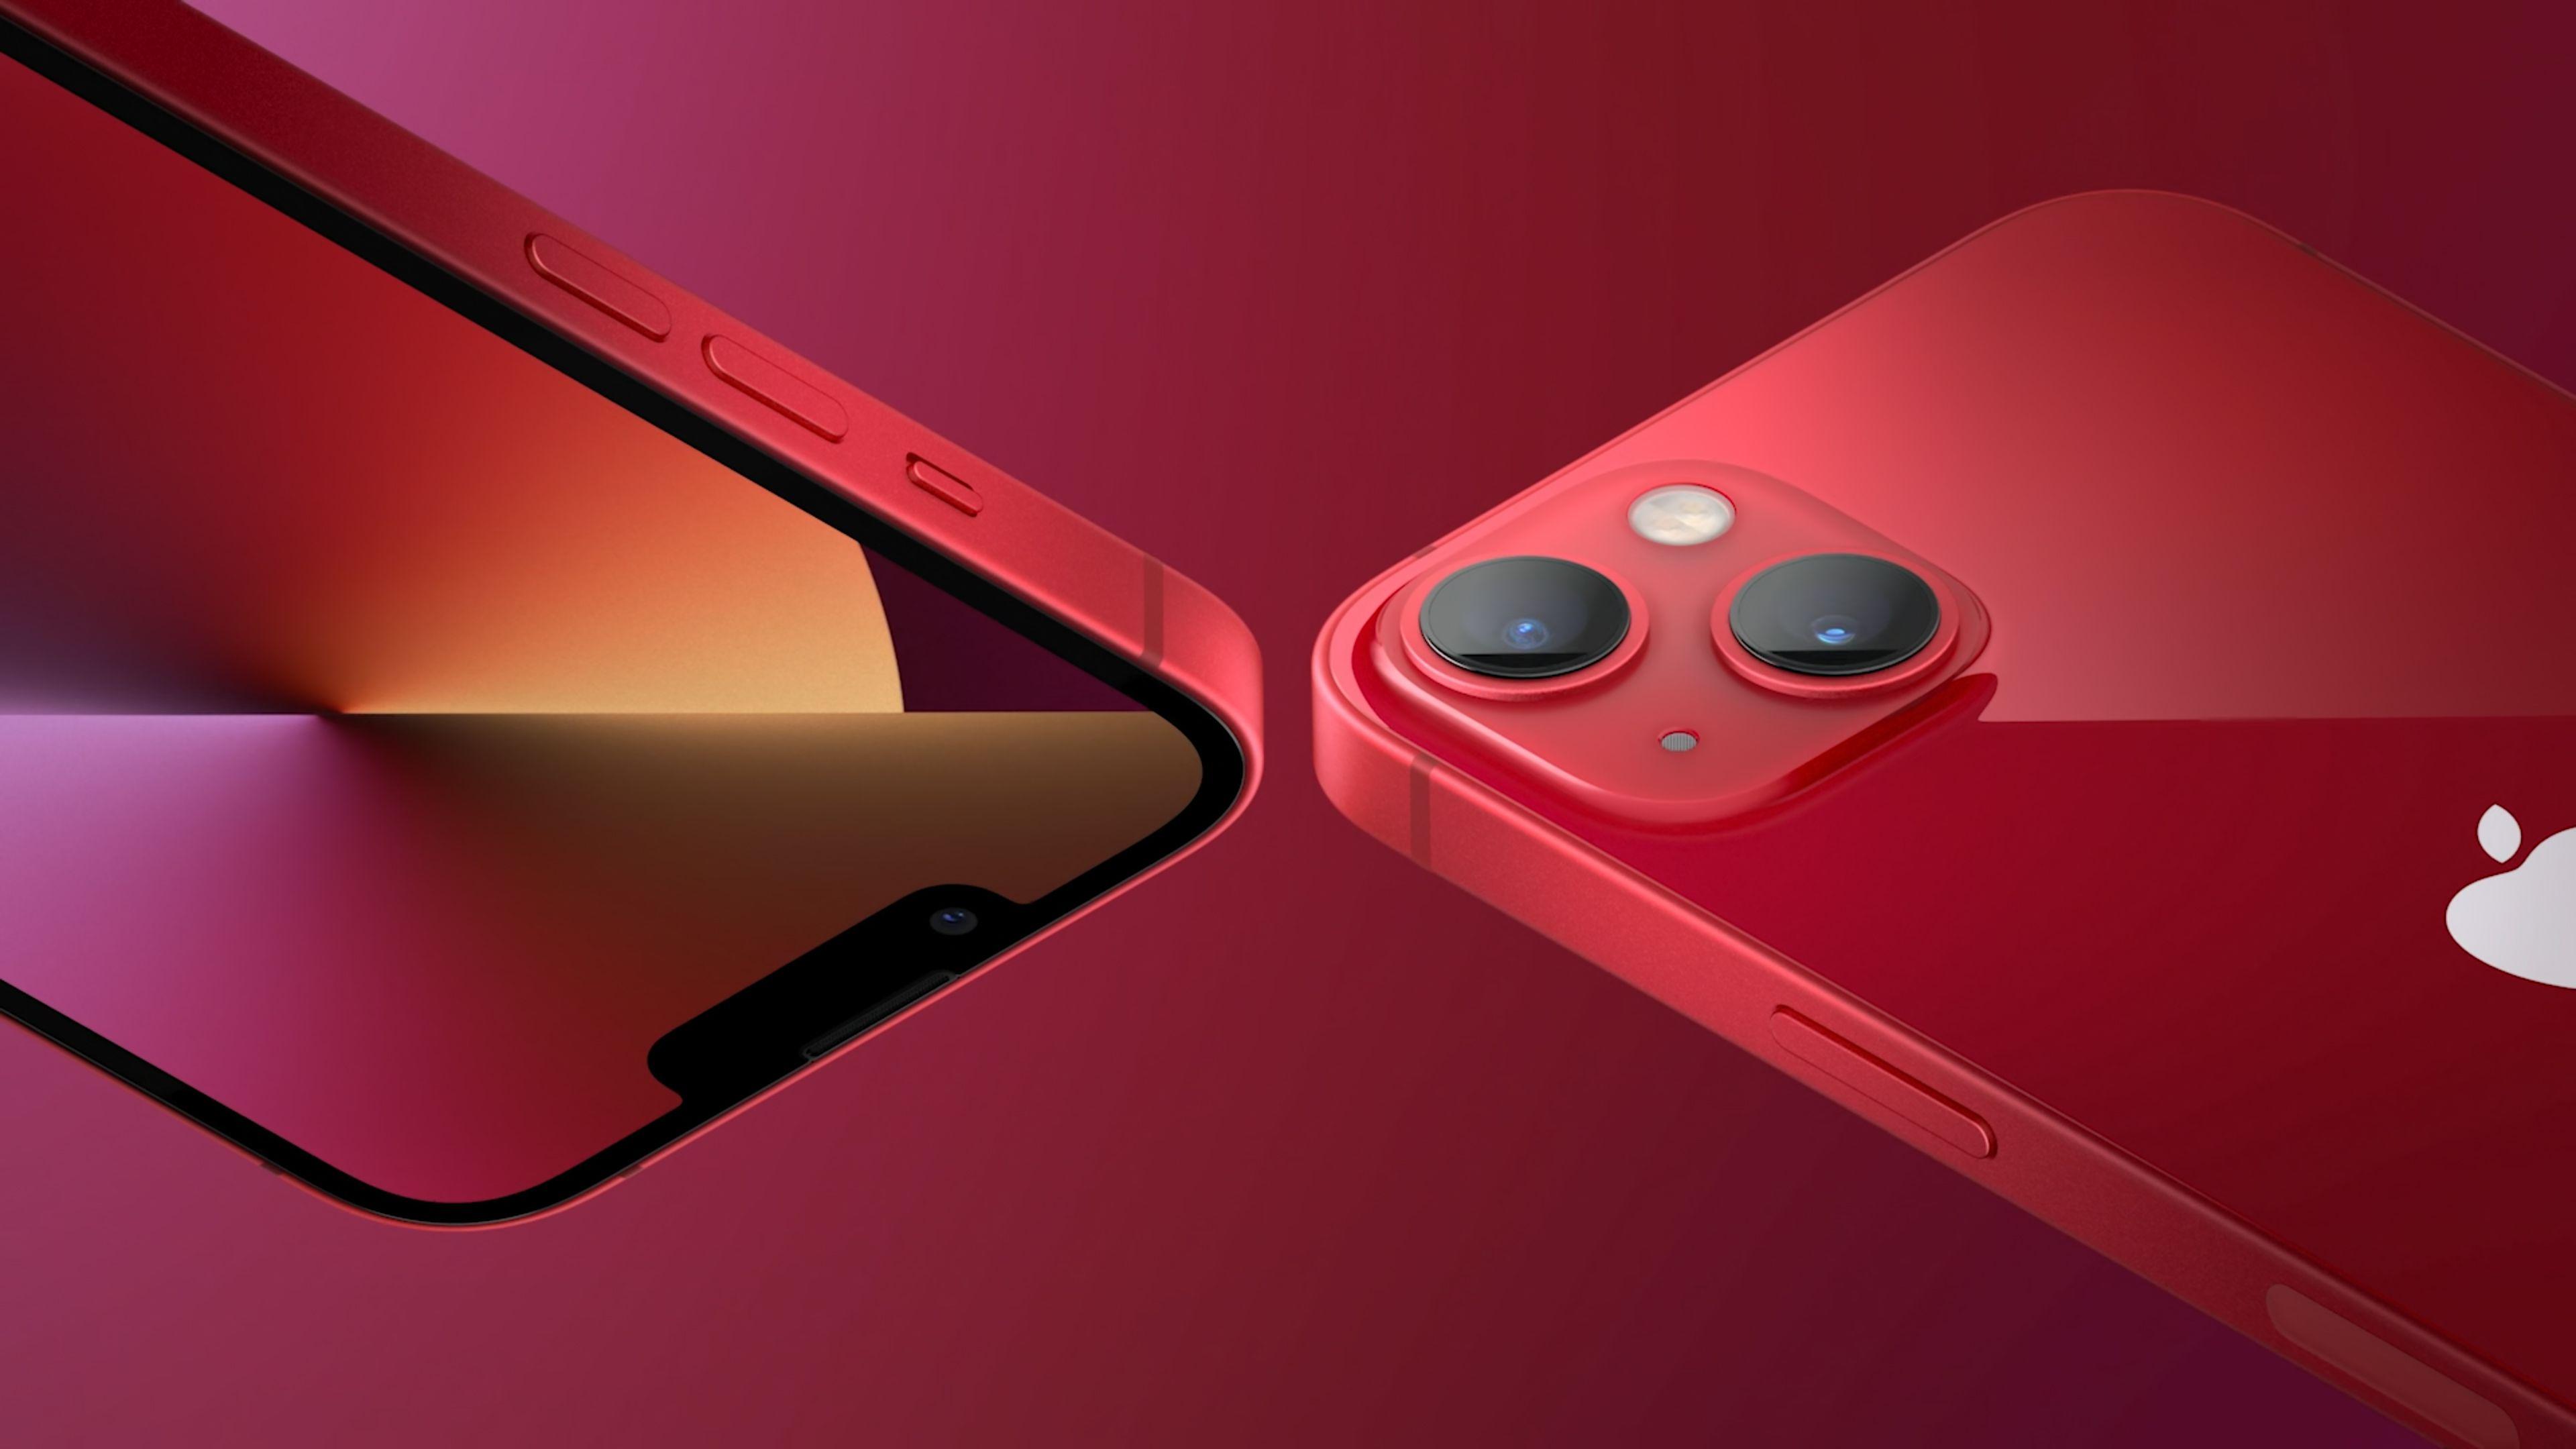 iphone-ios-15-2021-cnet-09